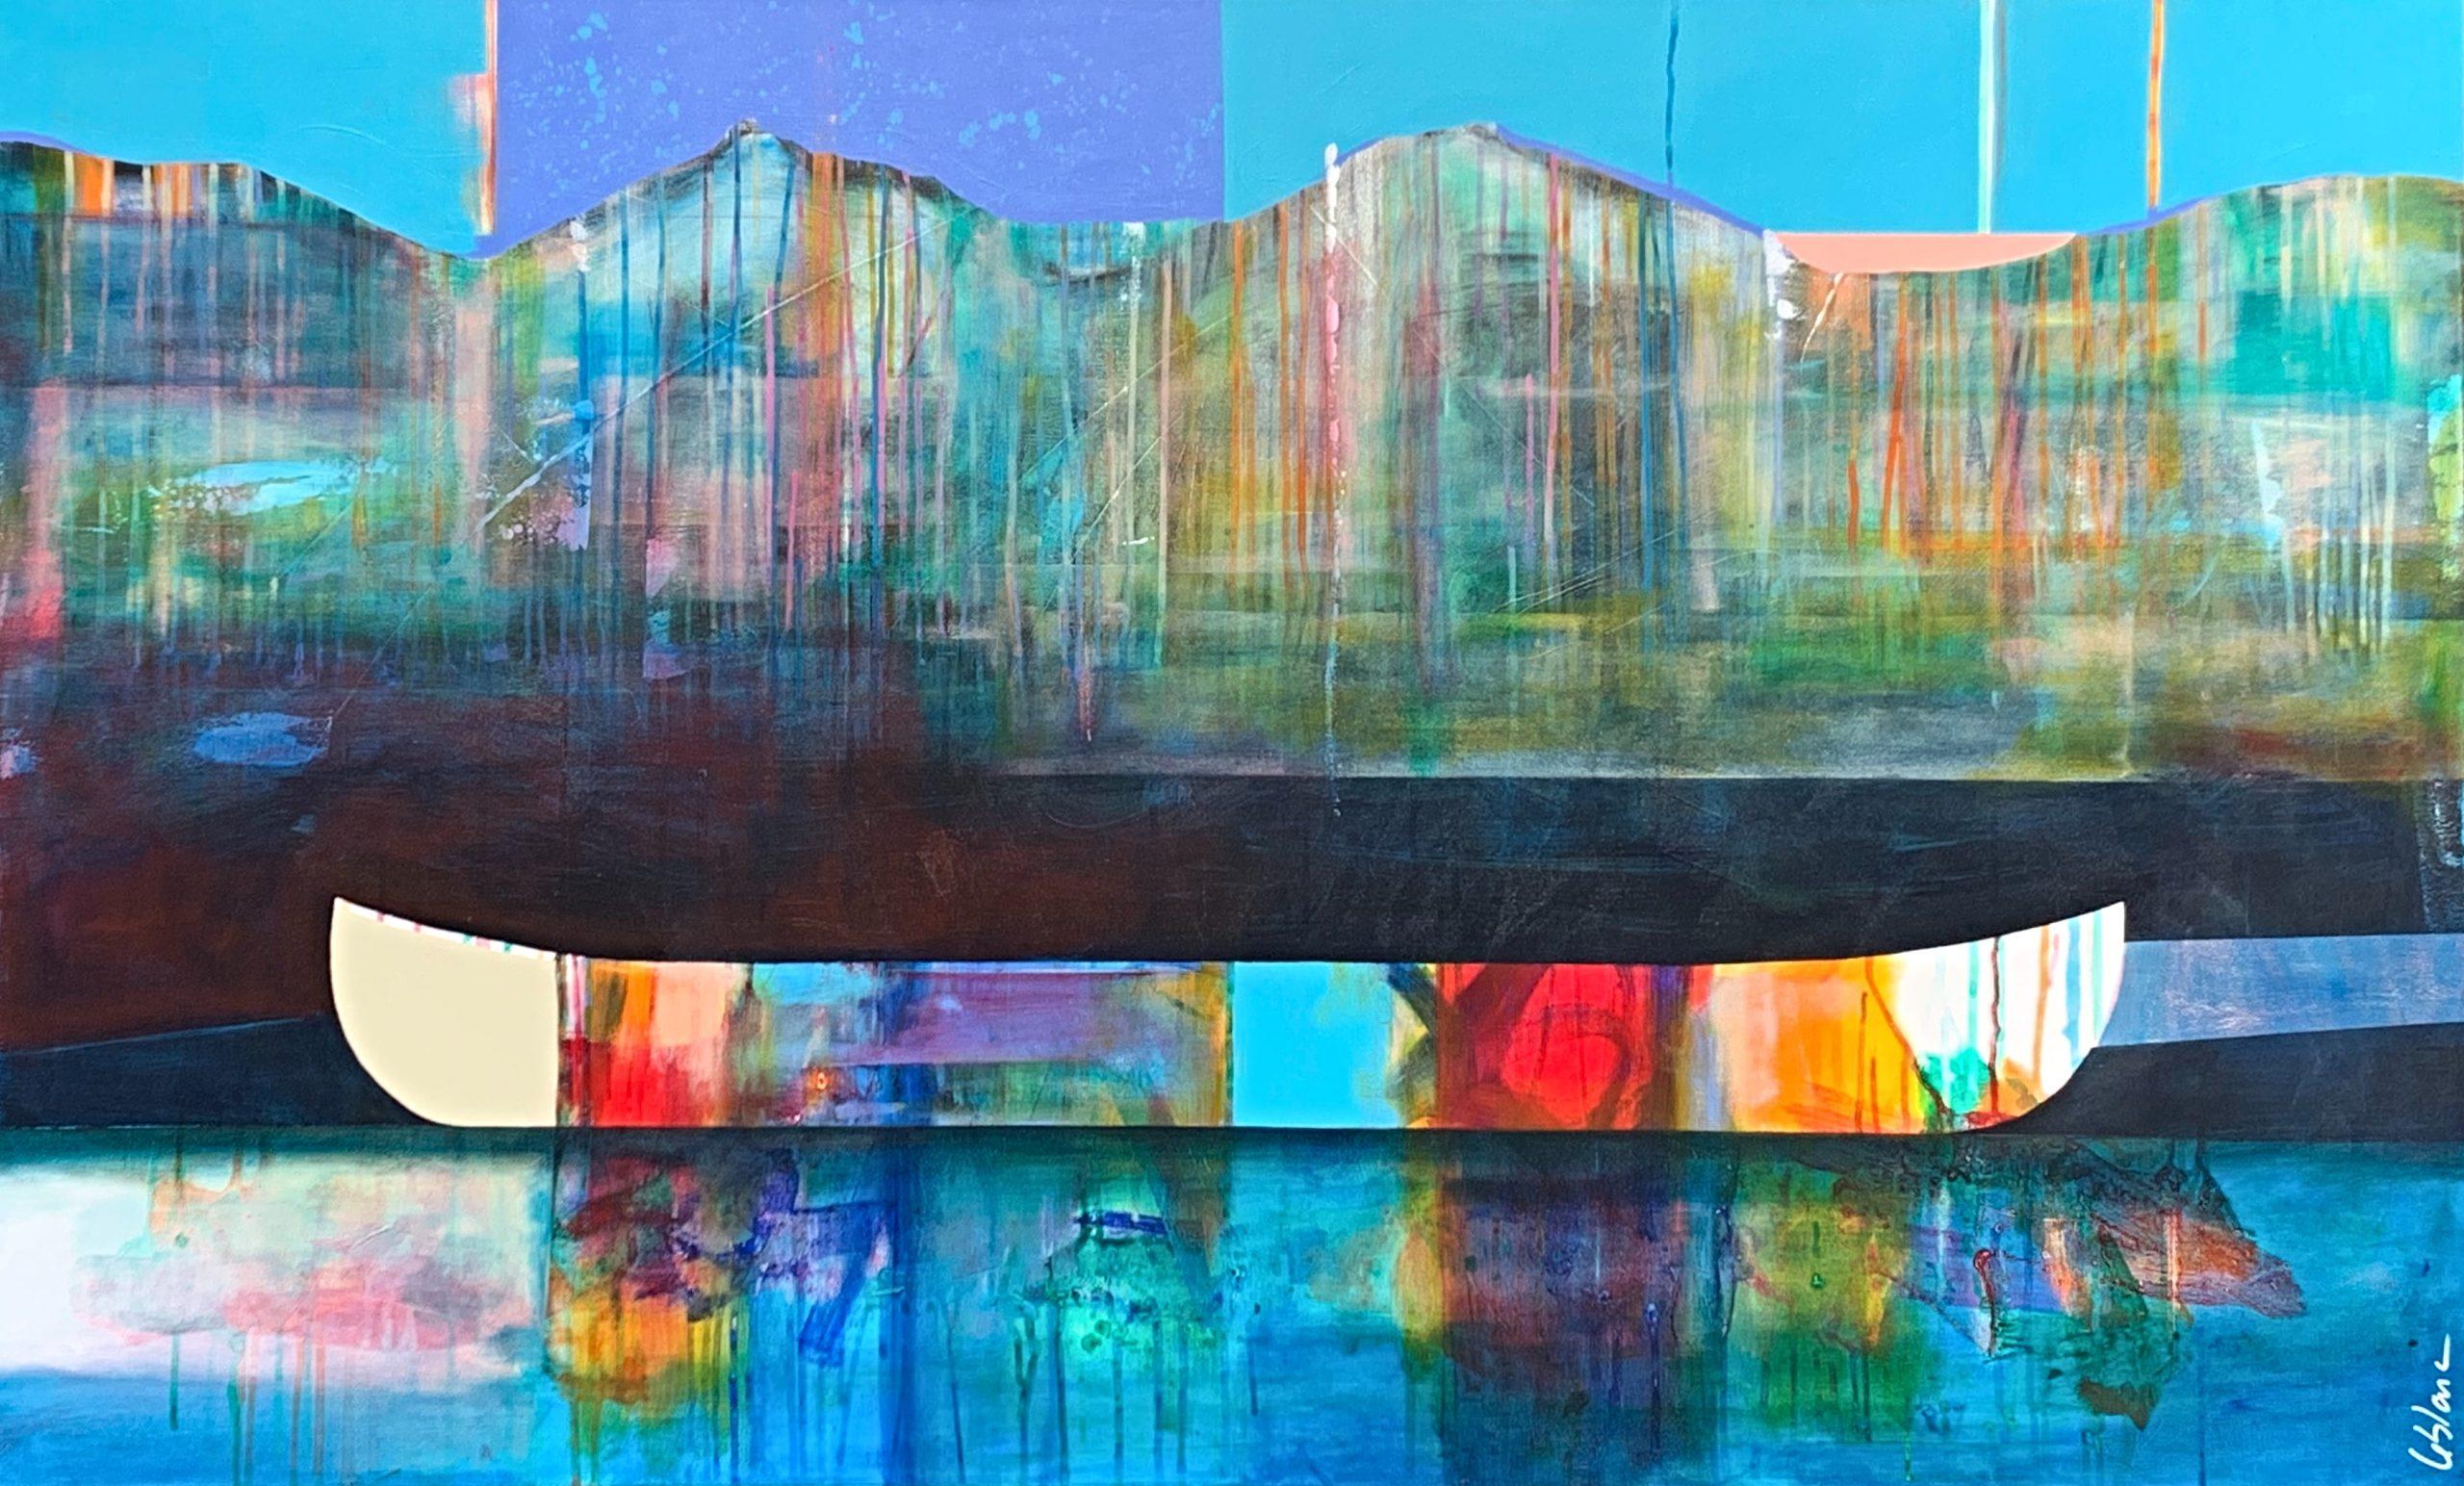 Comme un spectacle de couleurs, mixed media canoe painting by Sylvain Leblanc | Effusion Art Gallery + Cast Glass Studio, Invermere BC